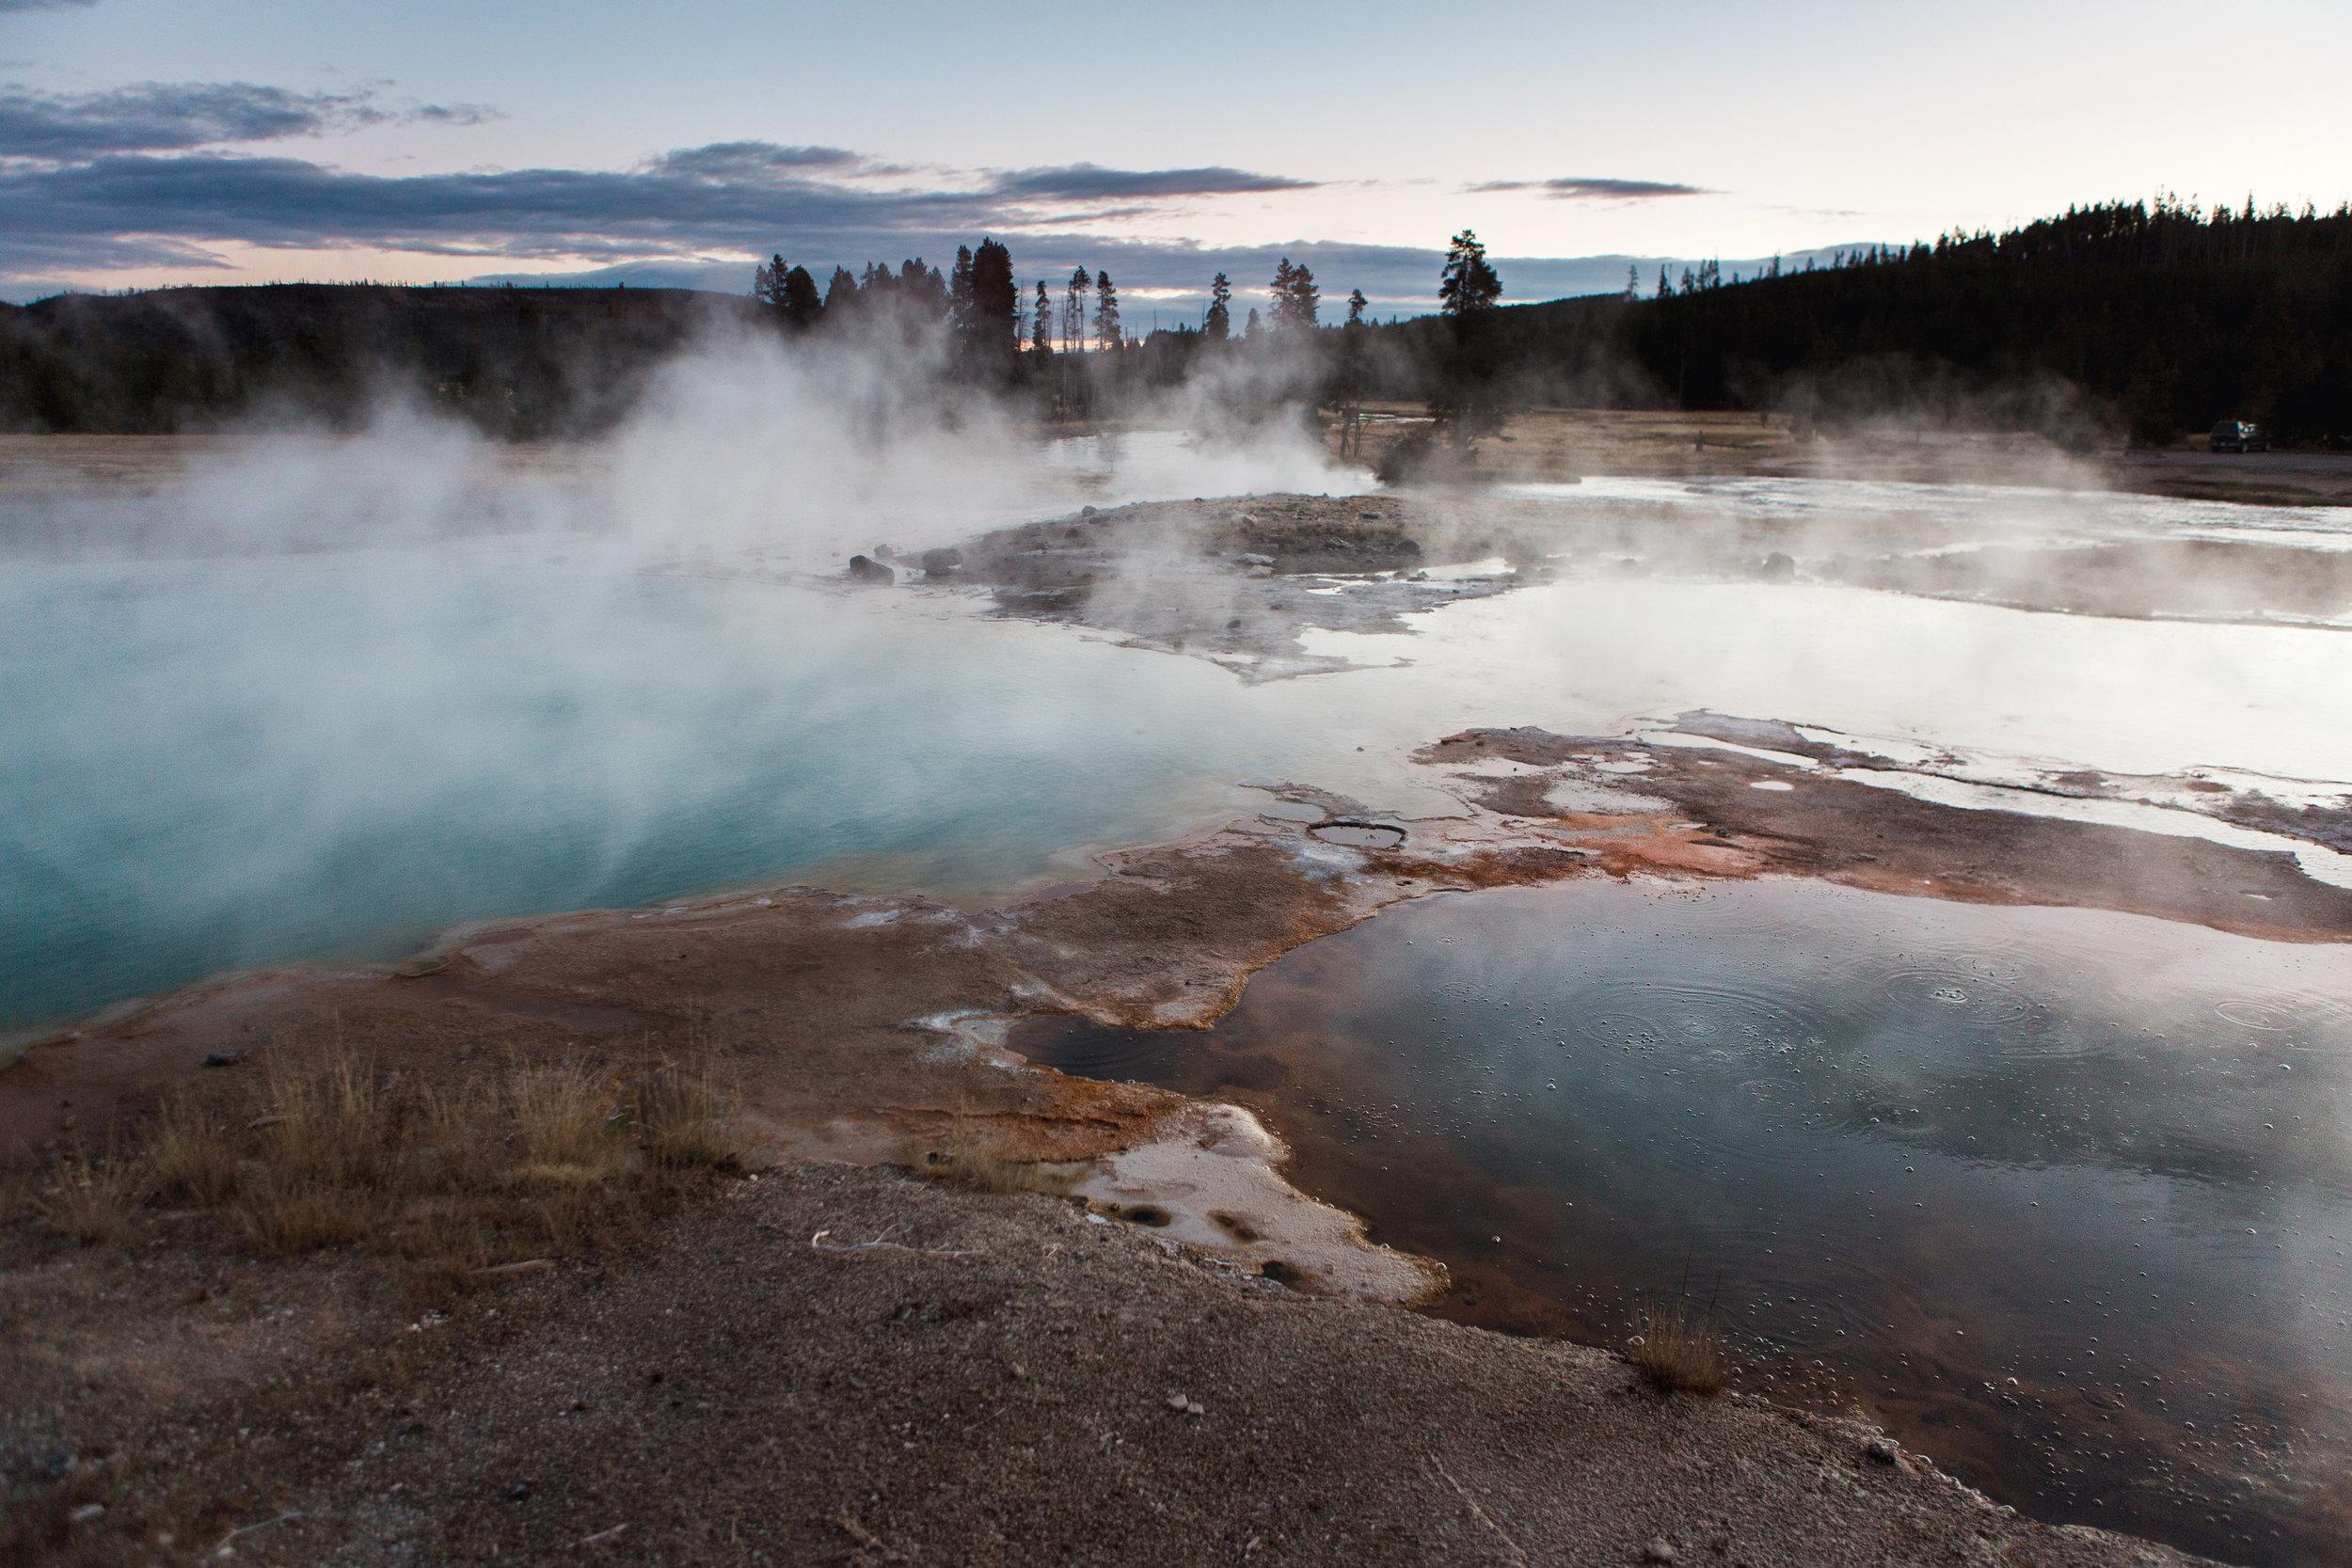 CindyGiovagnoli_outdoor_adventure_photography_Grand_Teton_Yellowstone_Glacier_National_Park_Montana_Wyoming_South_Dakota_Mount_Rushmore_Badlands-008.jpg